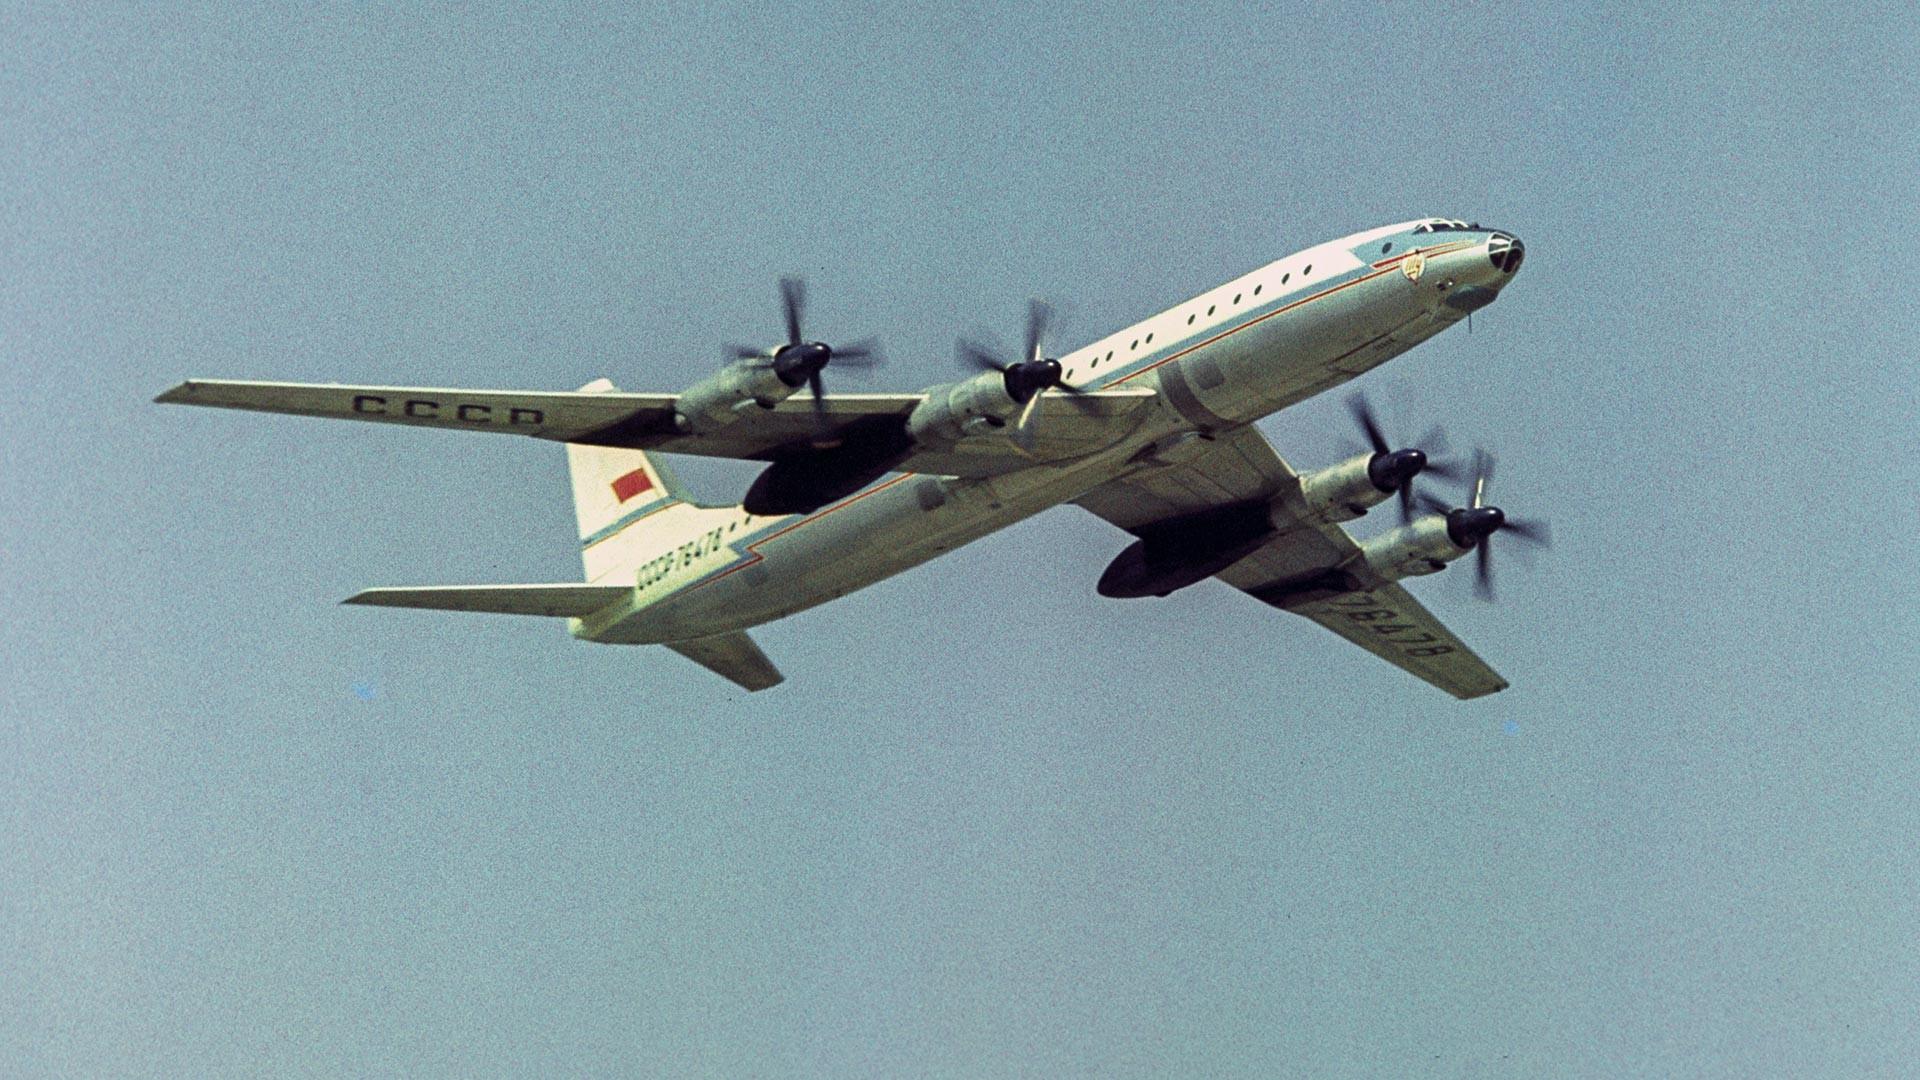 Ваздухопловна прослава на аеродрому Домодедово, поводом 50. годишњице Великог октобра. Путнички авион Ту-114.